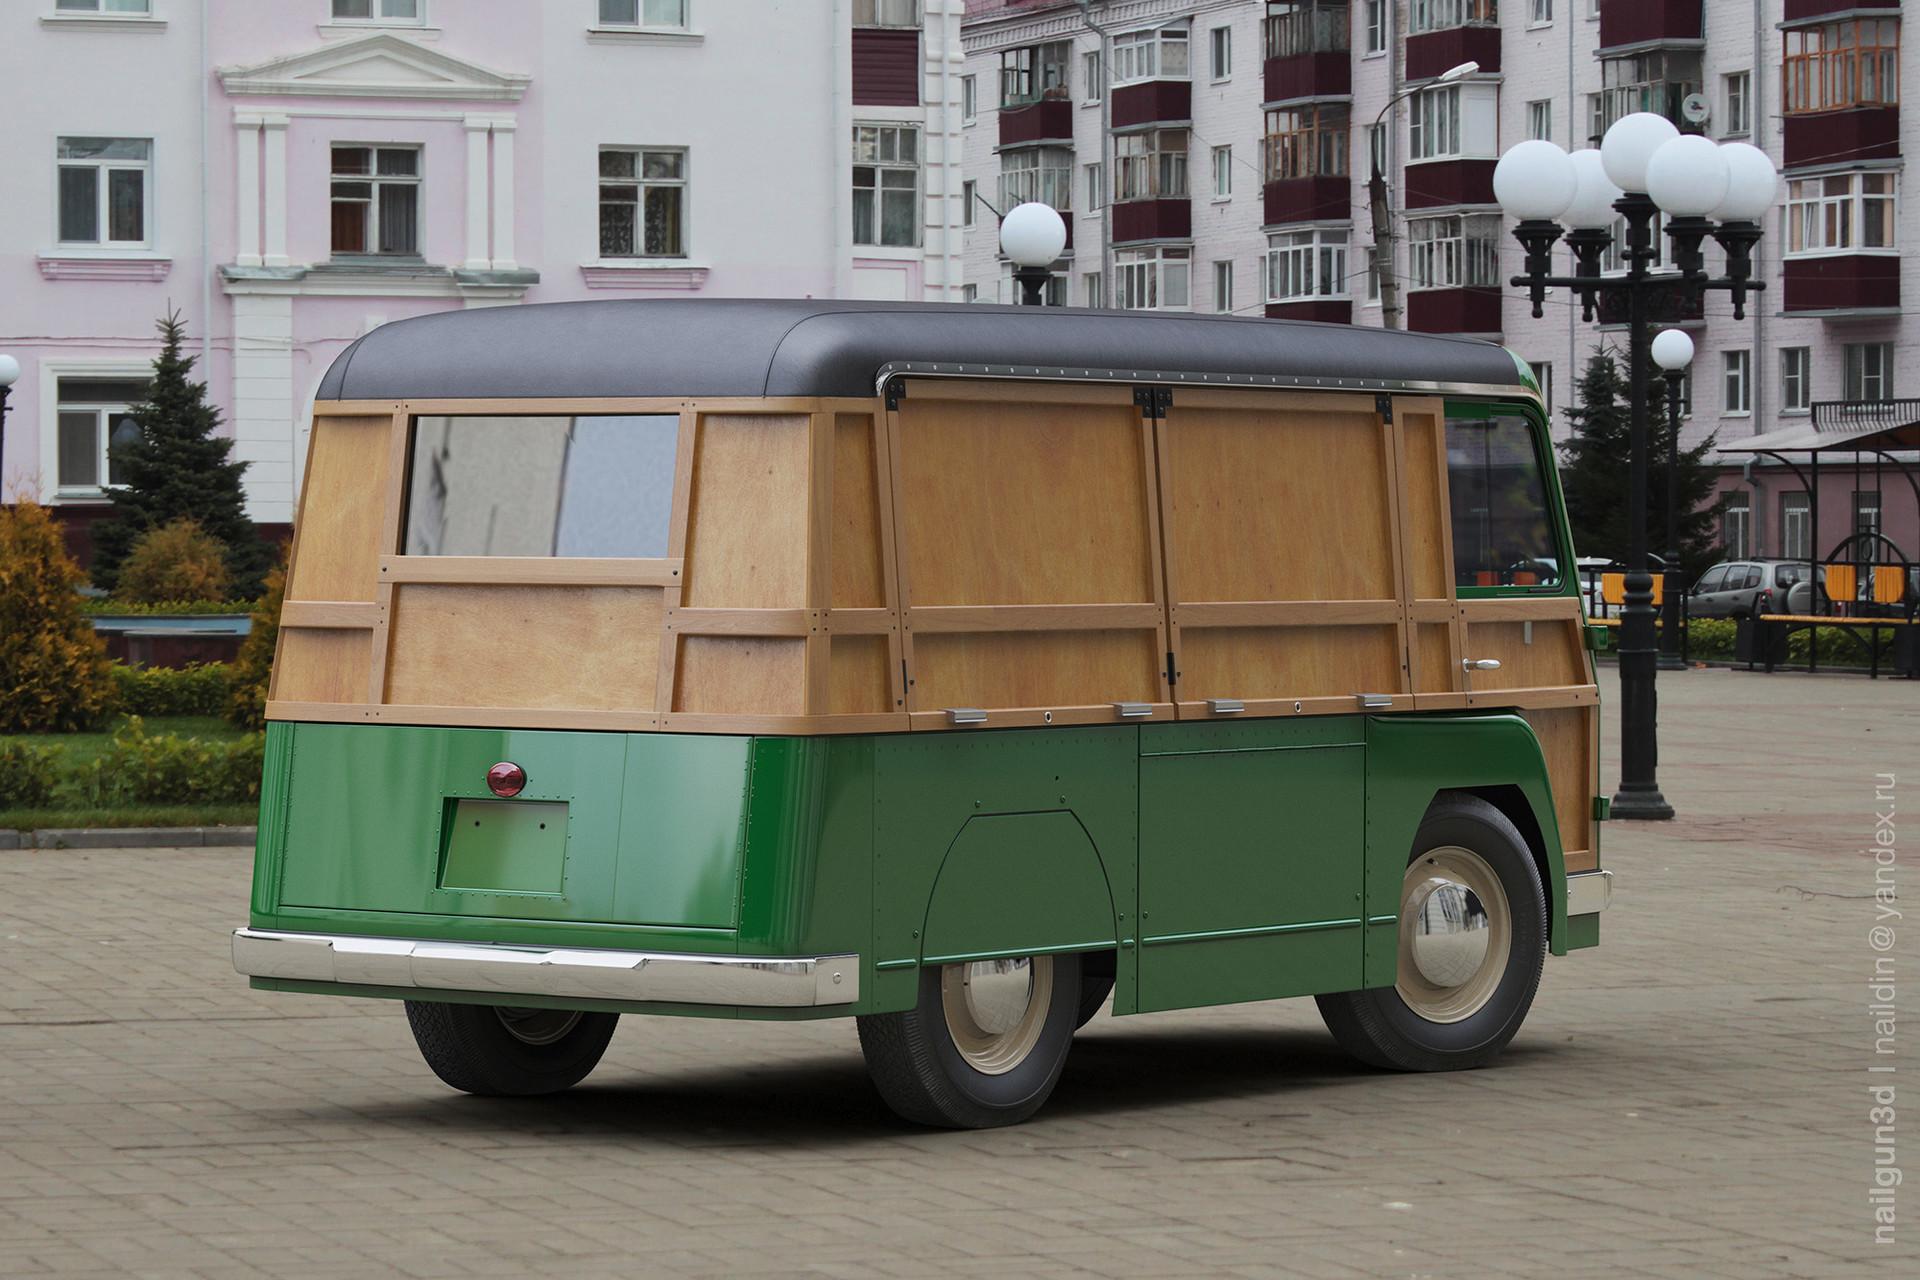 Nail khusnutdinov als 225 011 nami 750 rear view 3x